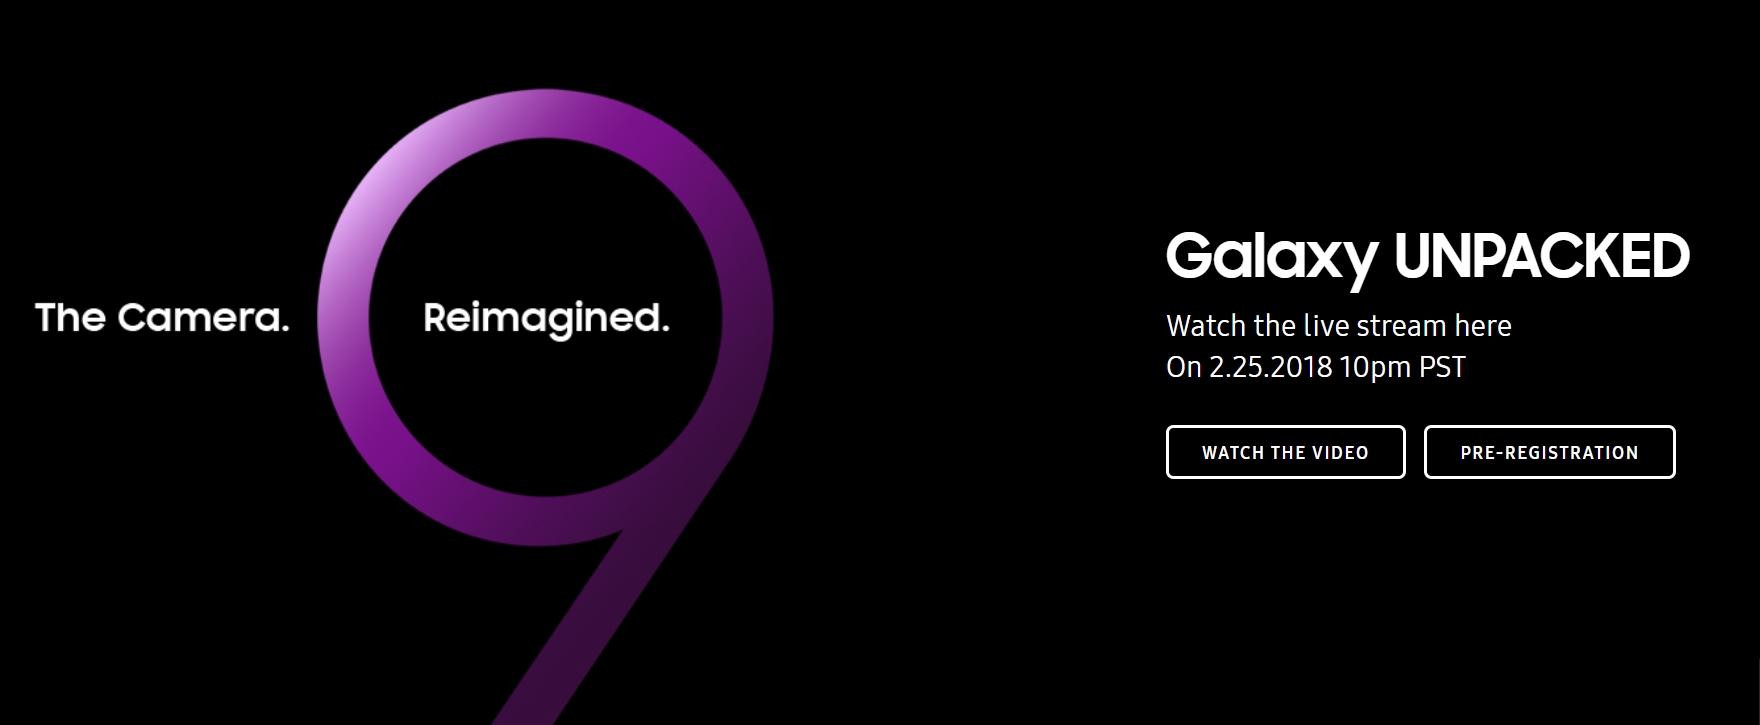 Samsung Unpacked 2018 Live resources